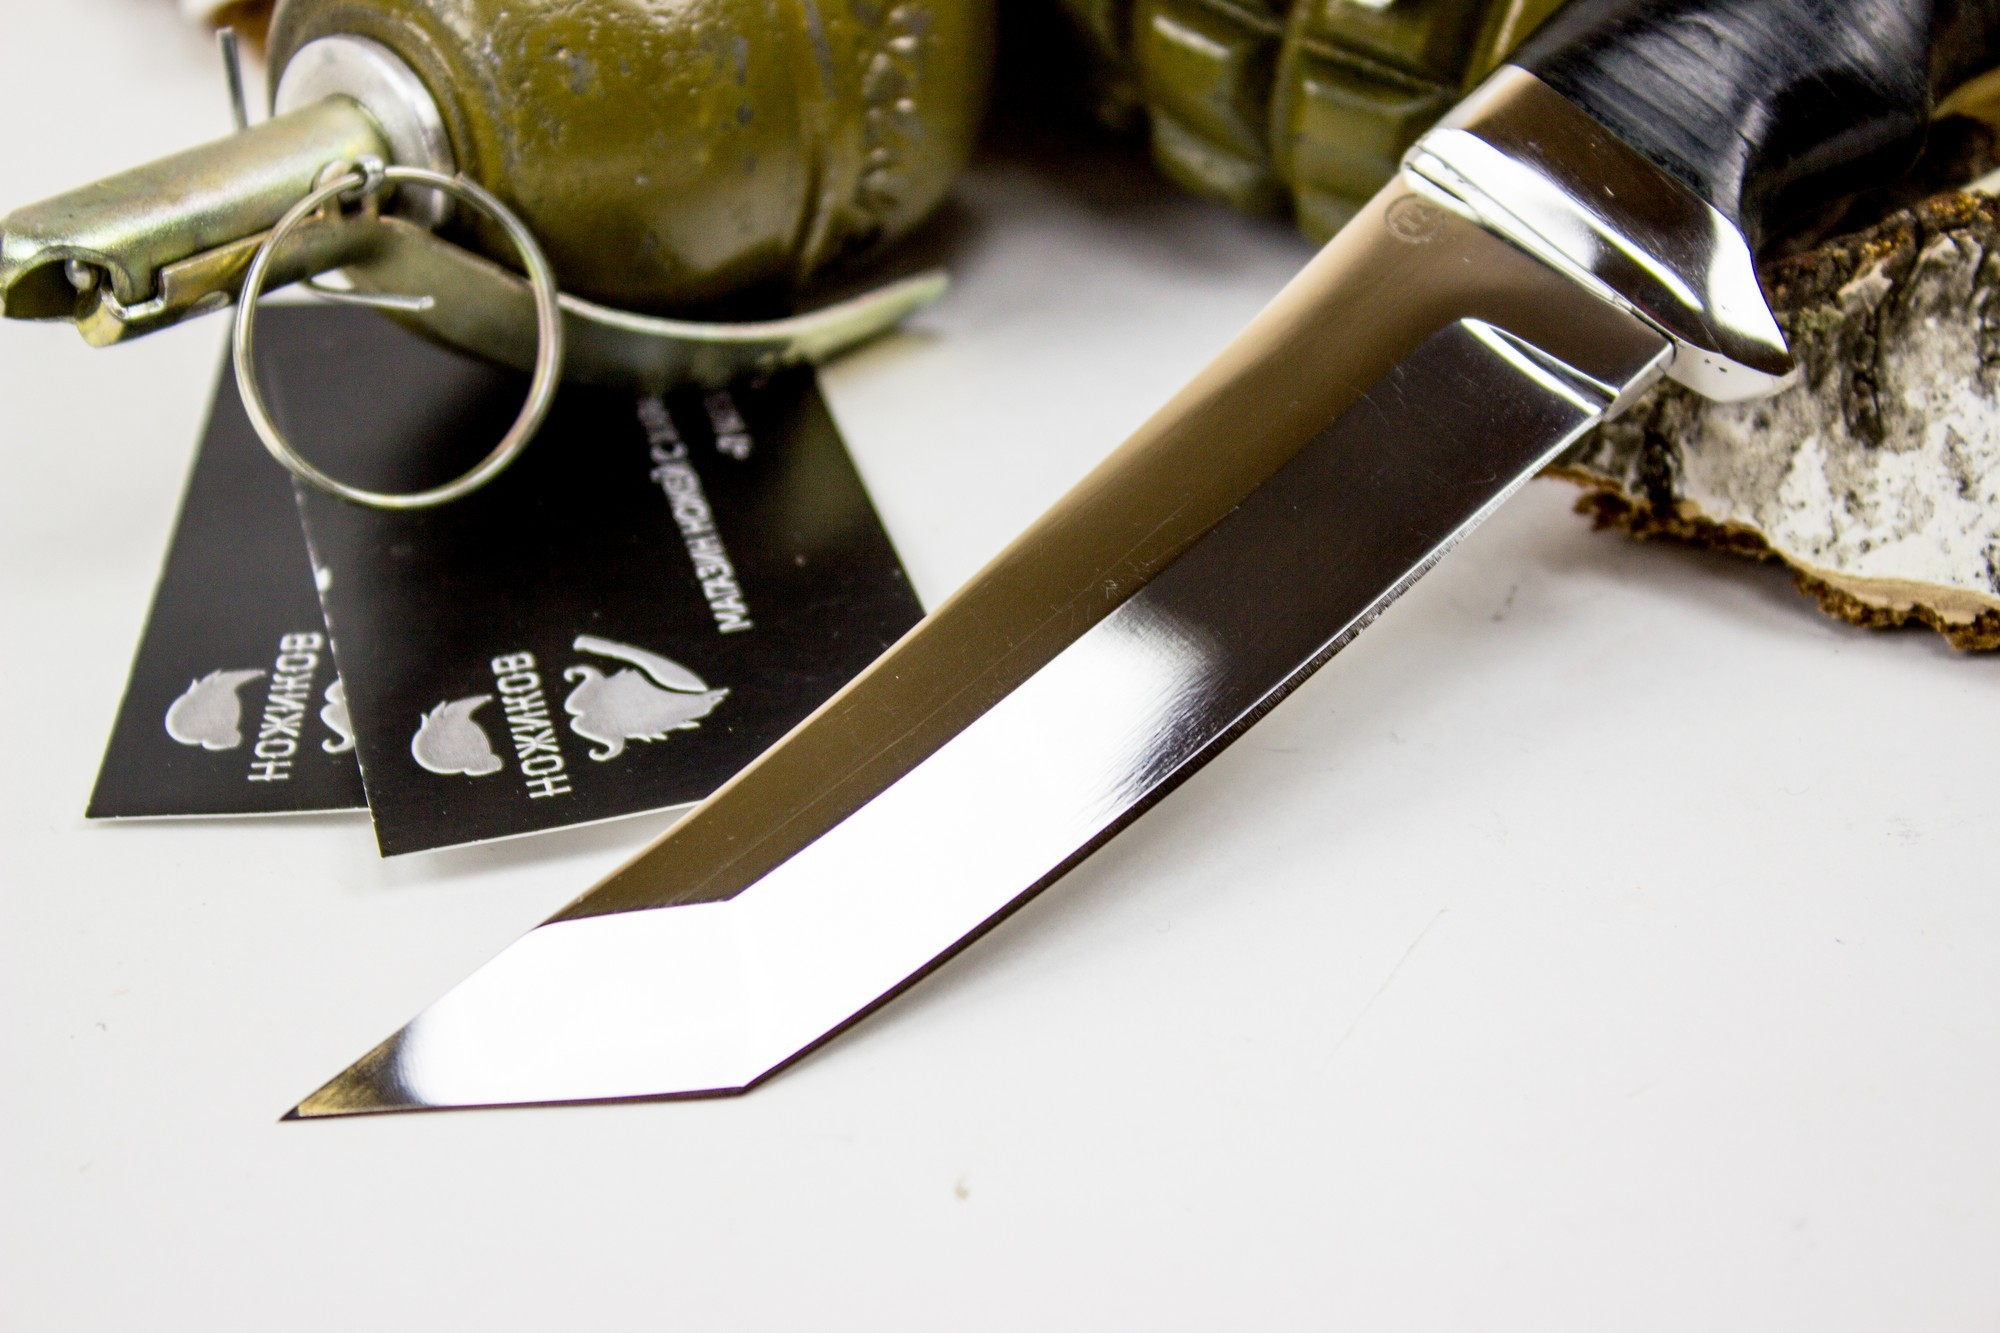 Фото 3 - Нож Аркан, сталь 95х18, кожа от Титов и Солдатова